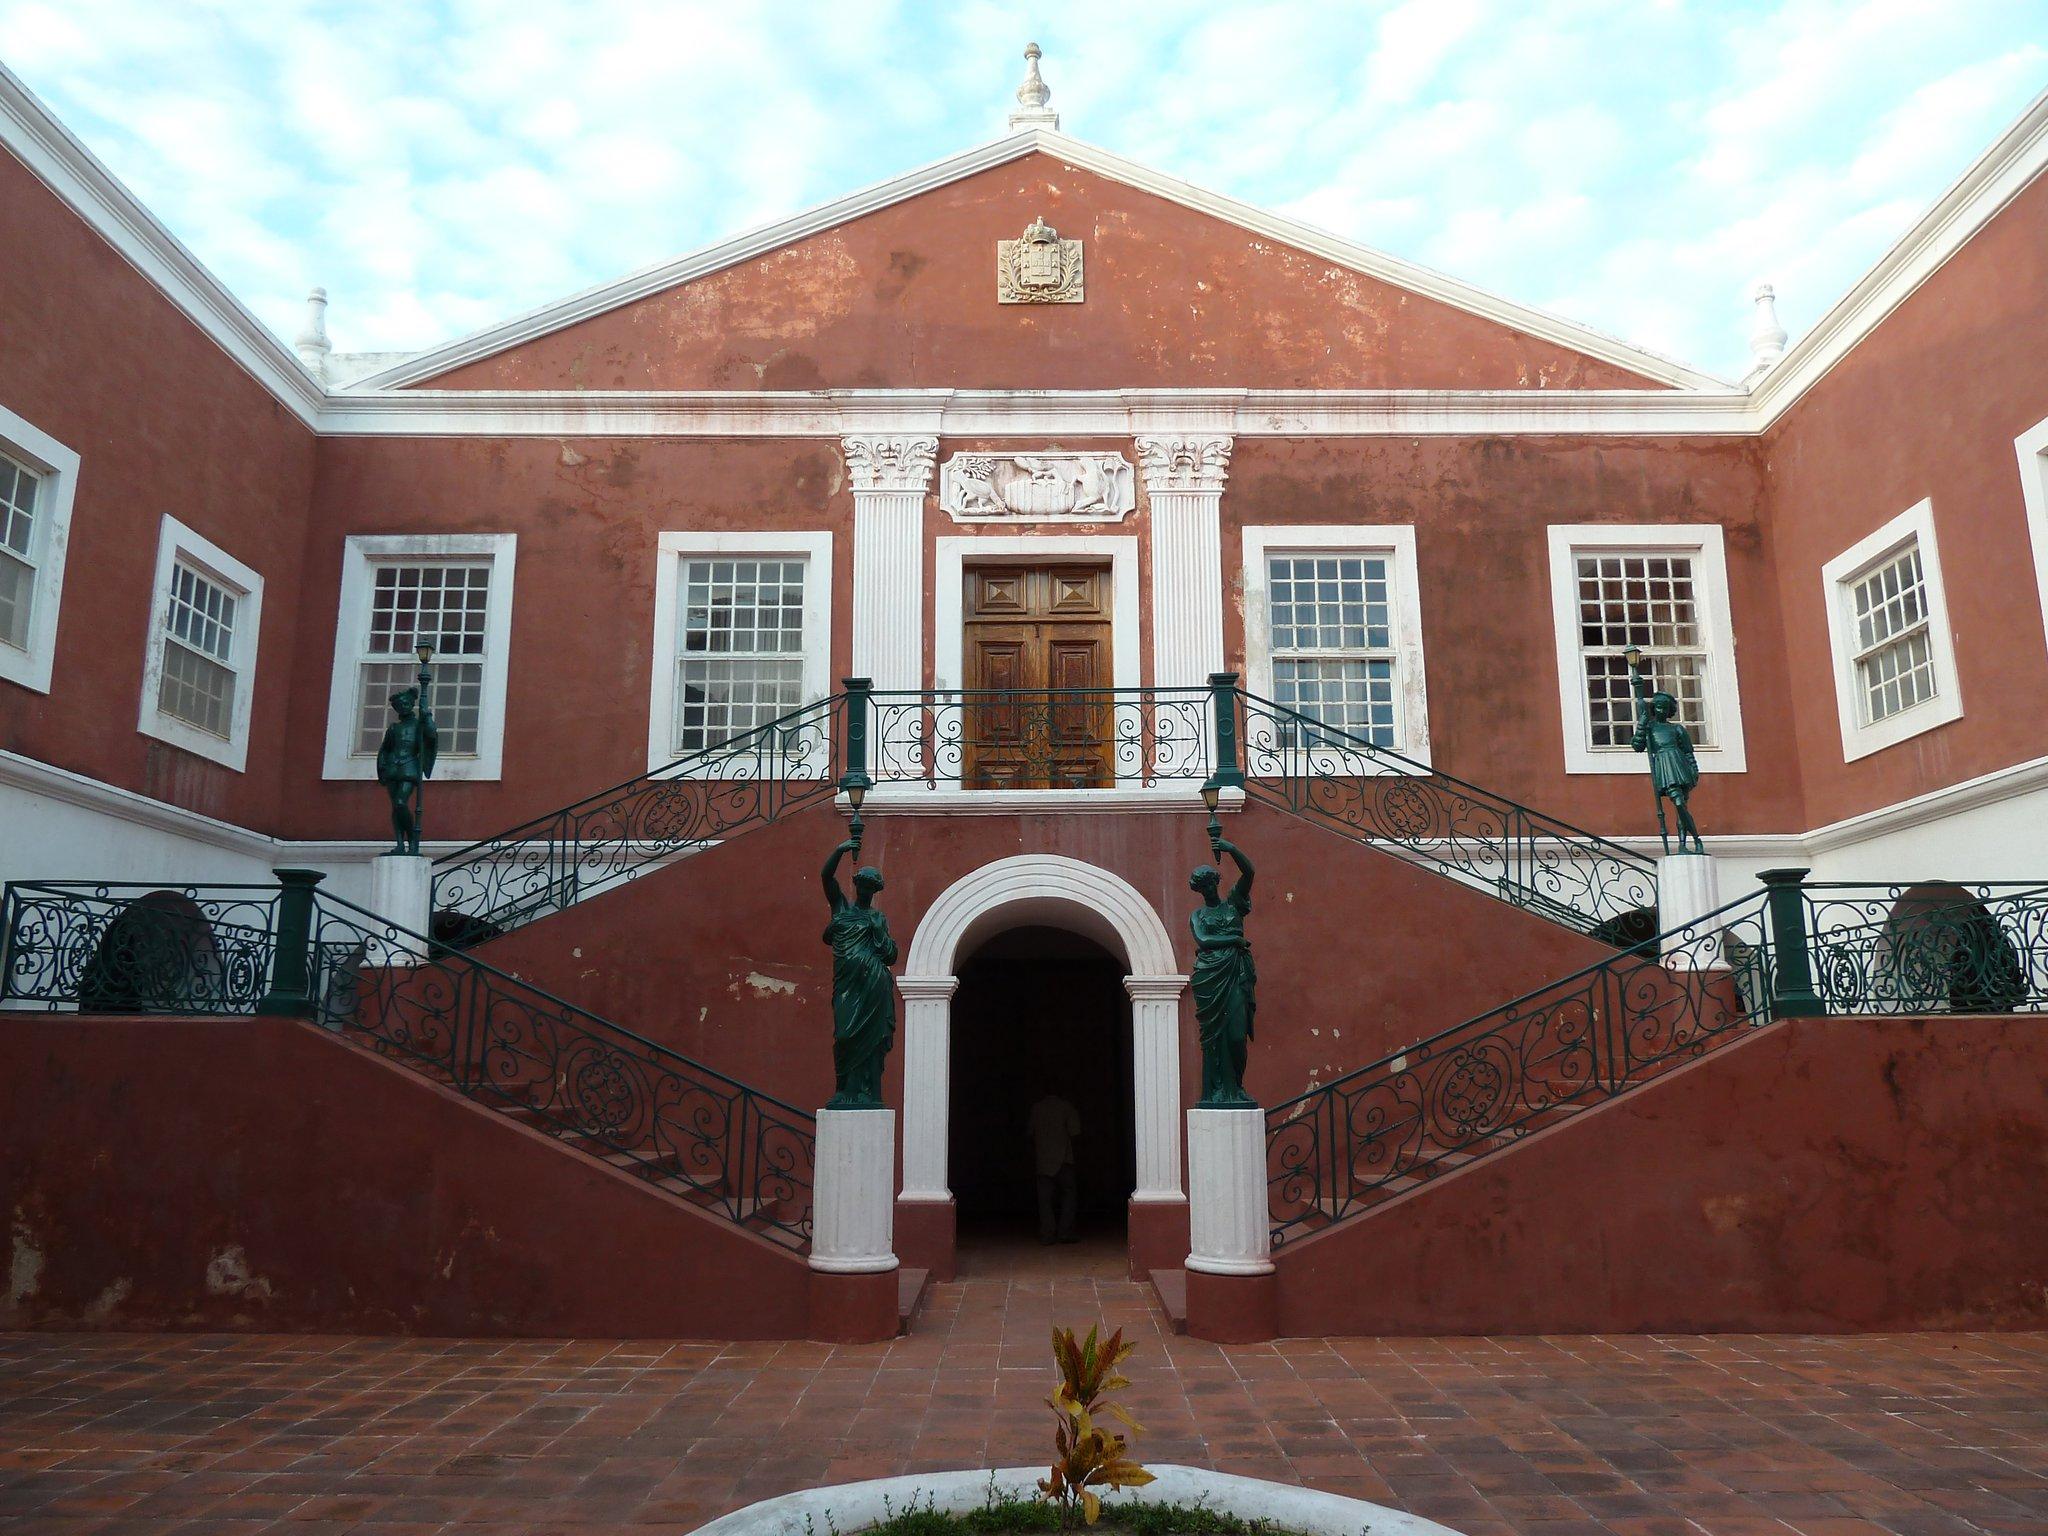 Palácio de S. Paulo, Ilha de Moçambique